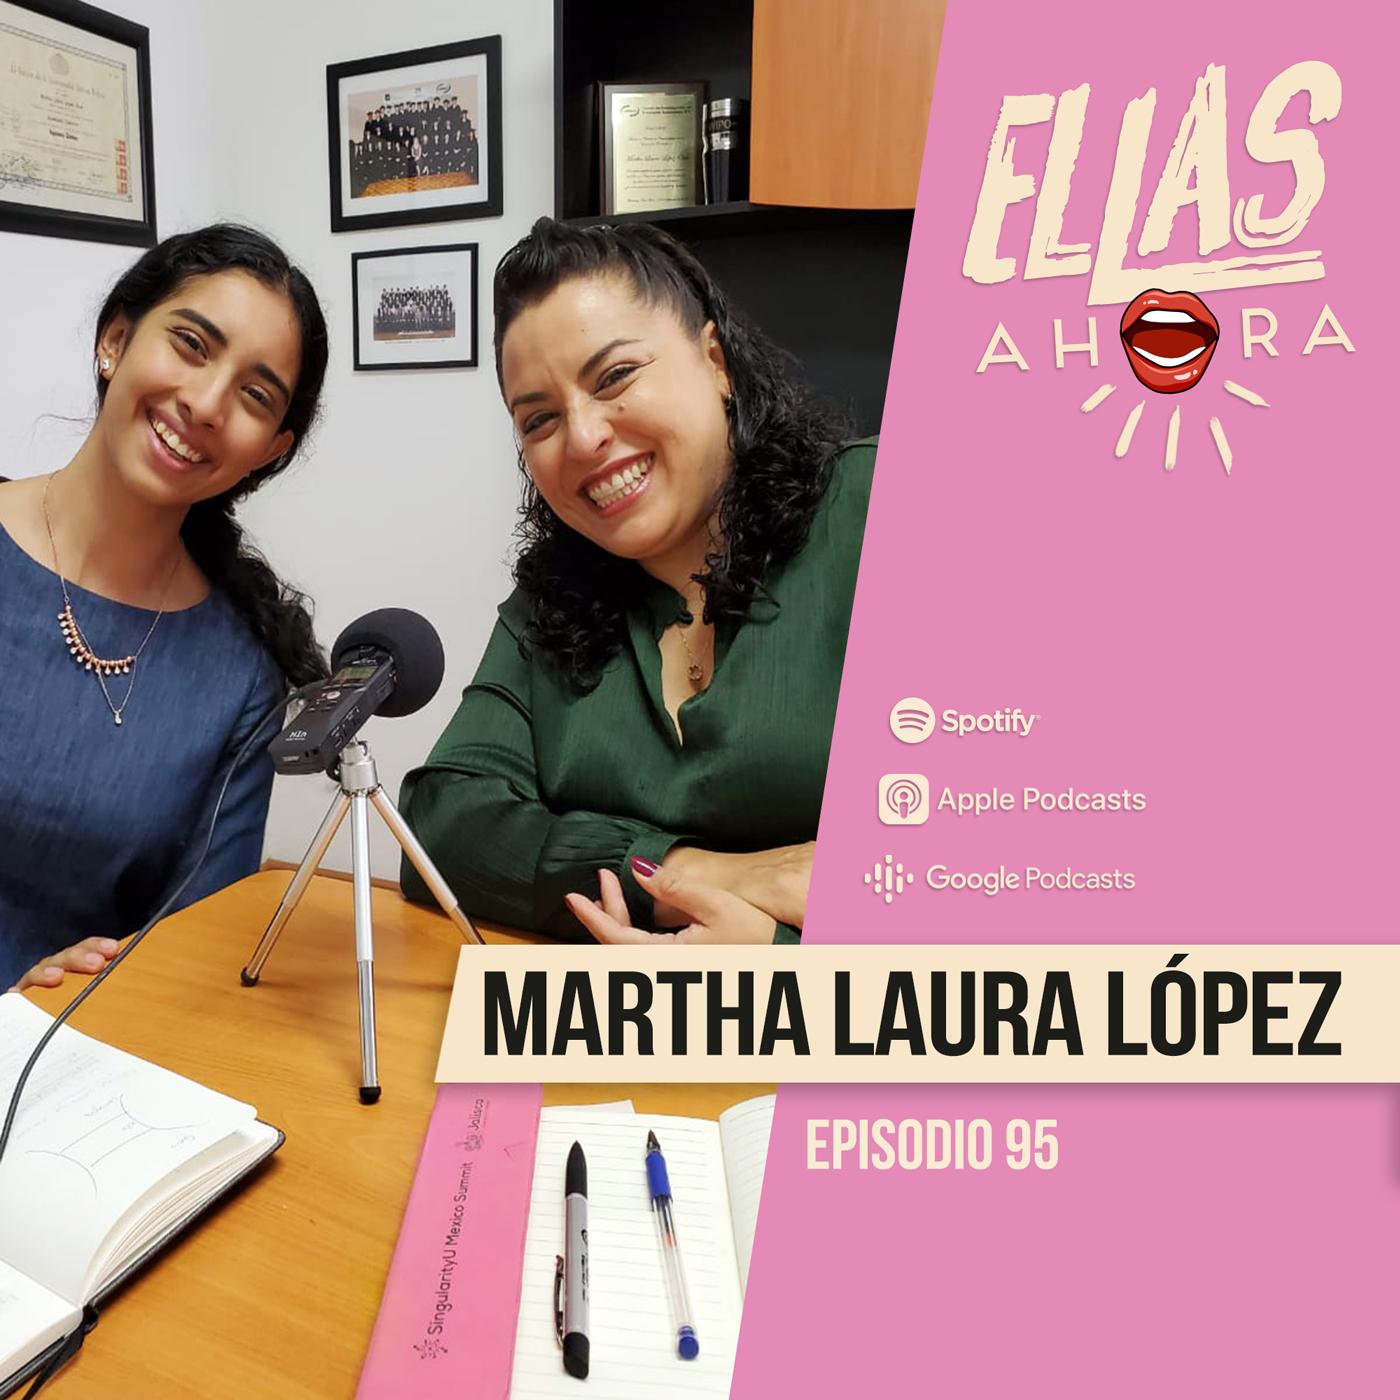 Martha Laura López